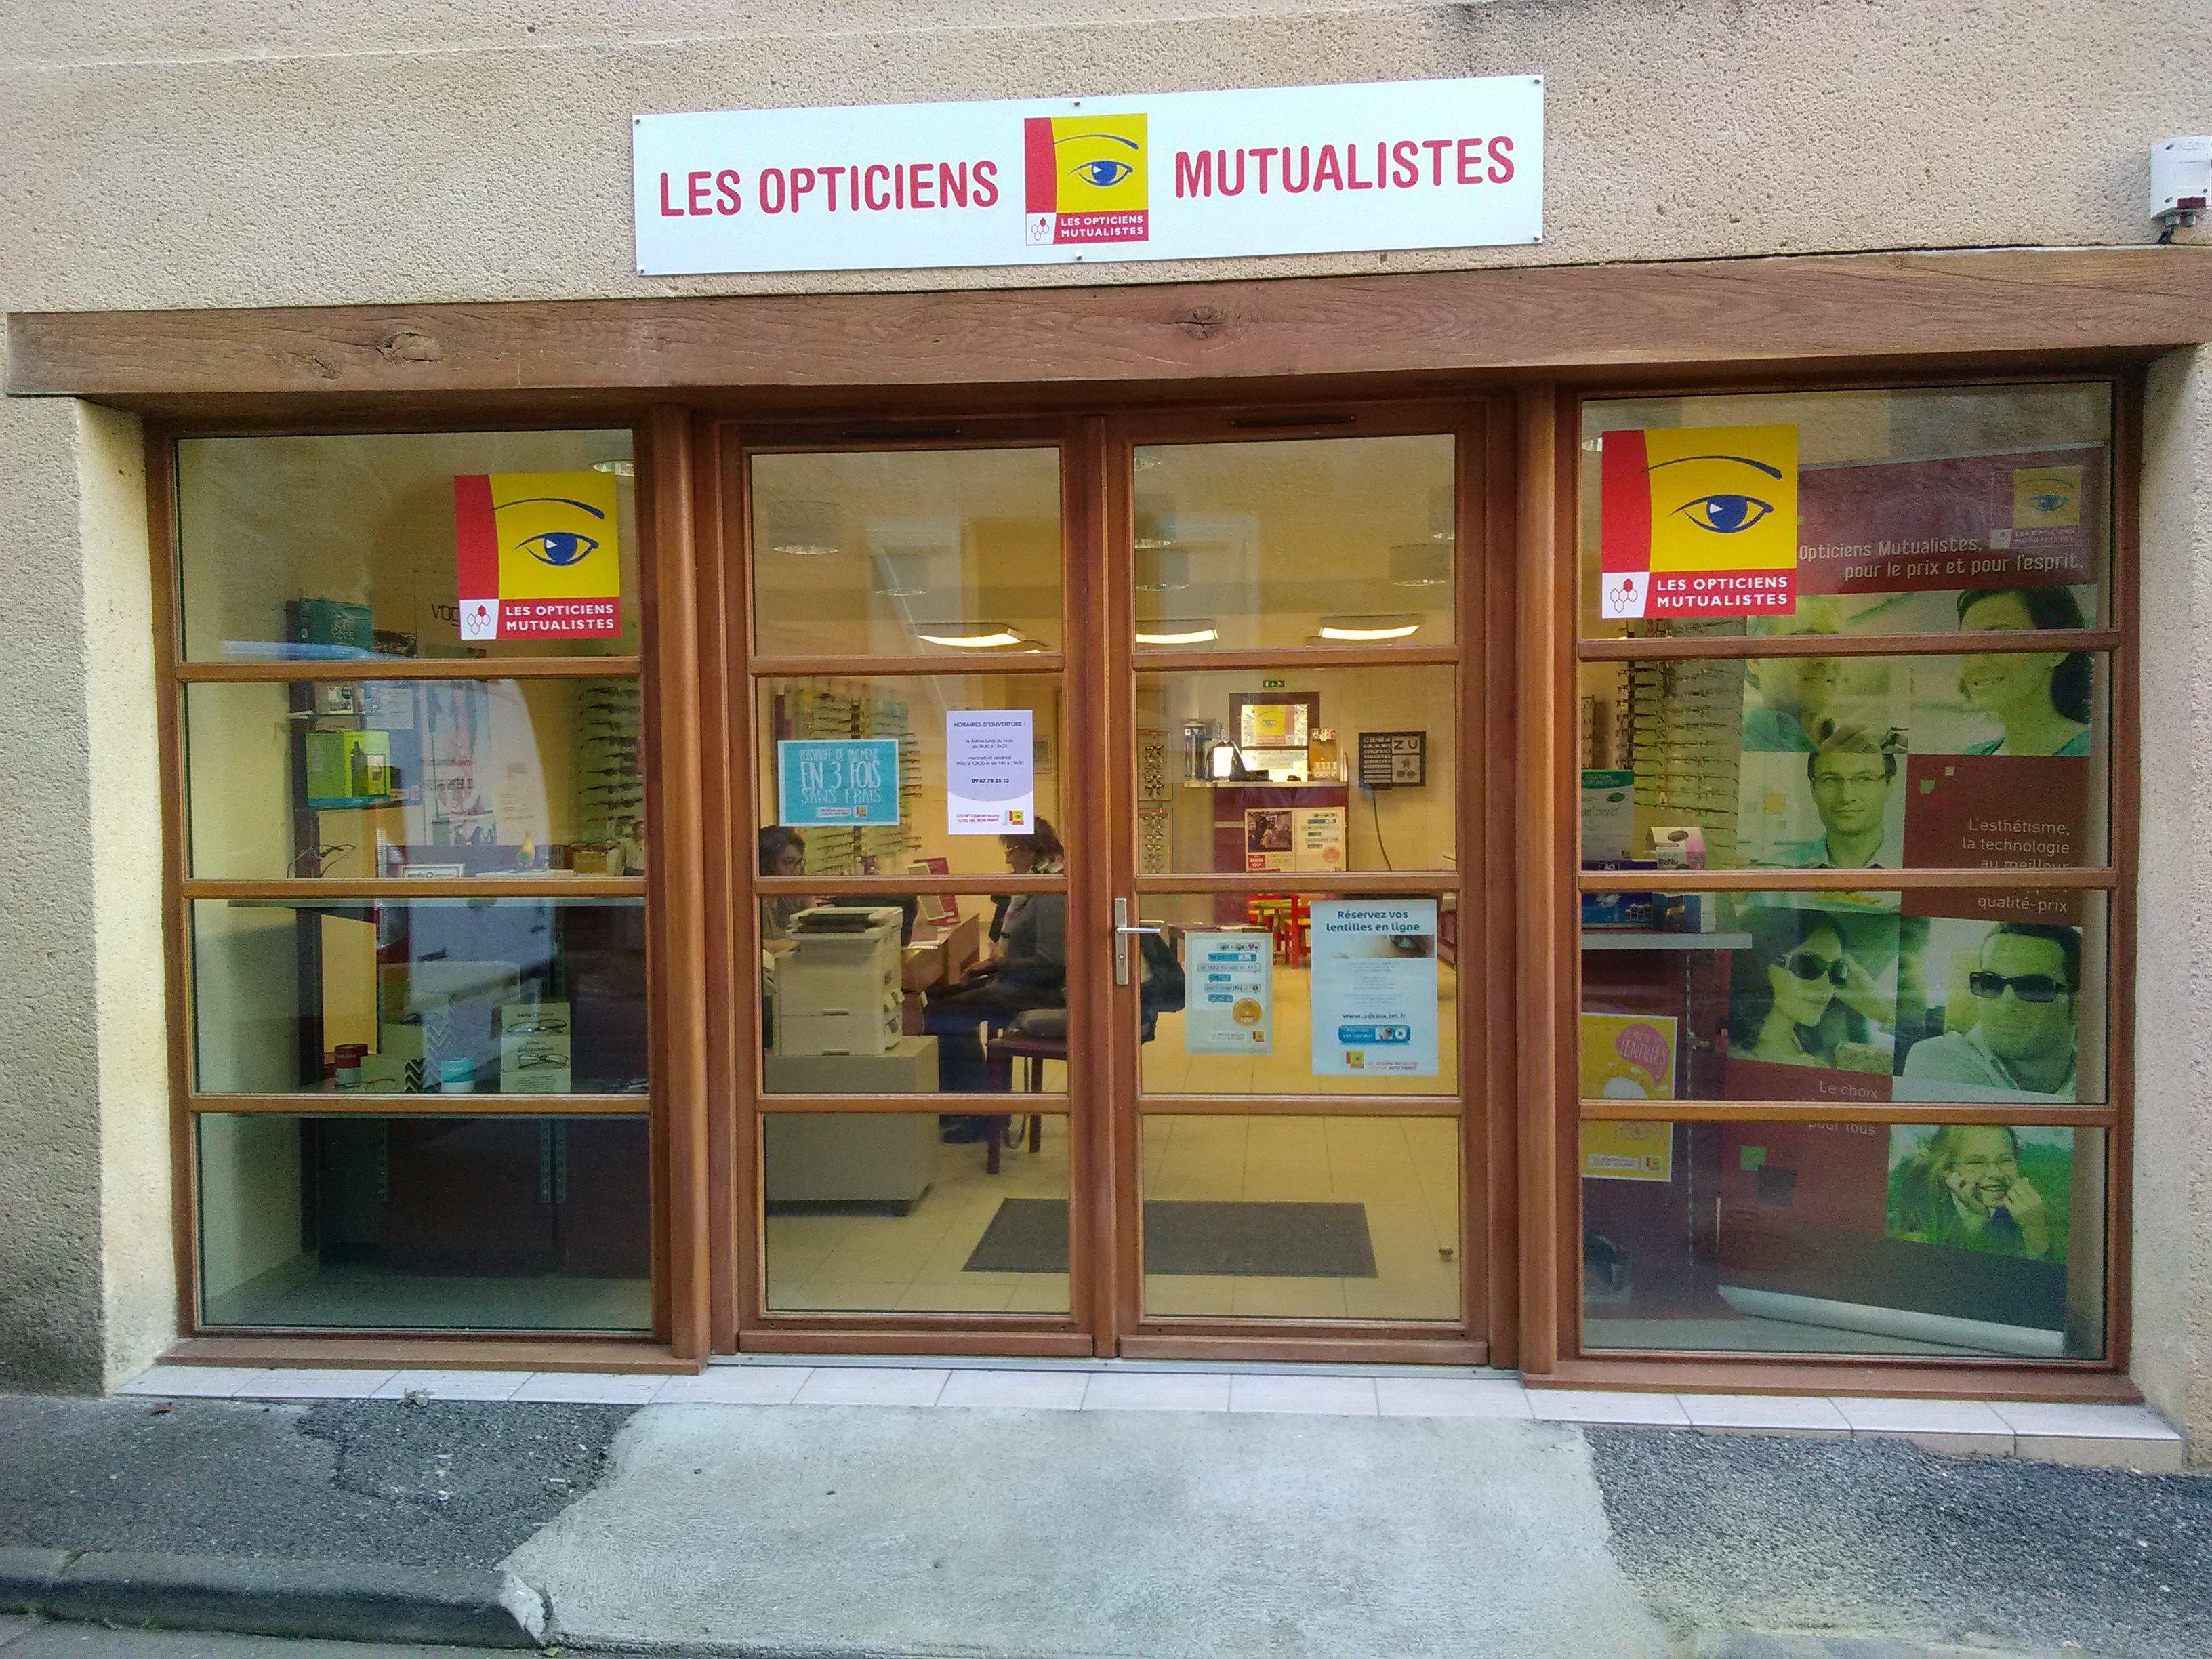 Mutualistesumqr– Marival Opticiens Les Lacapelle Udsma thdrCsxQ